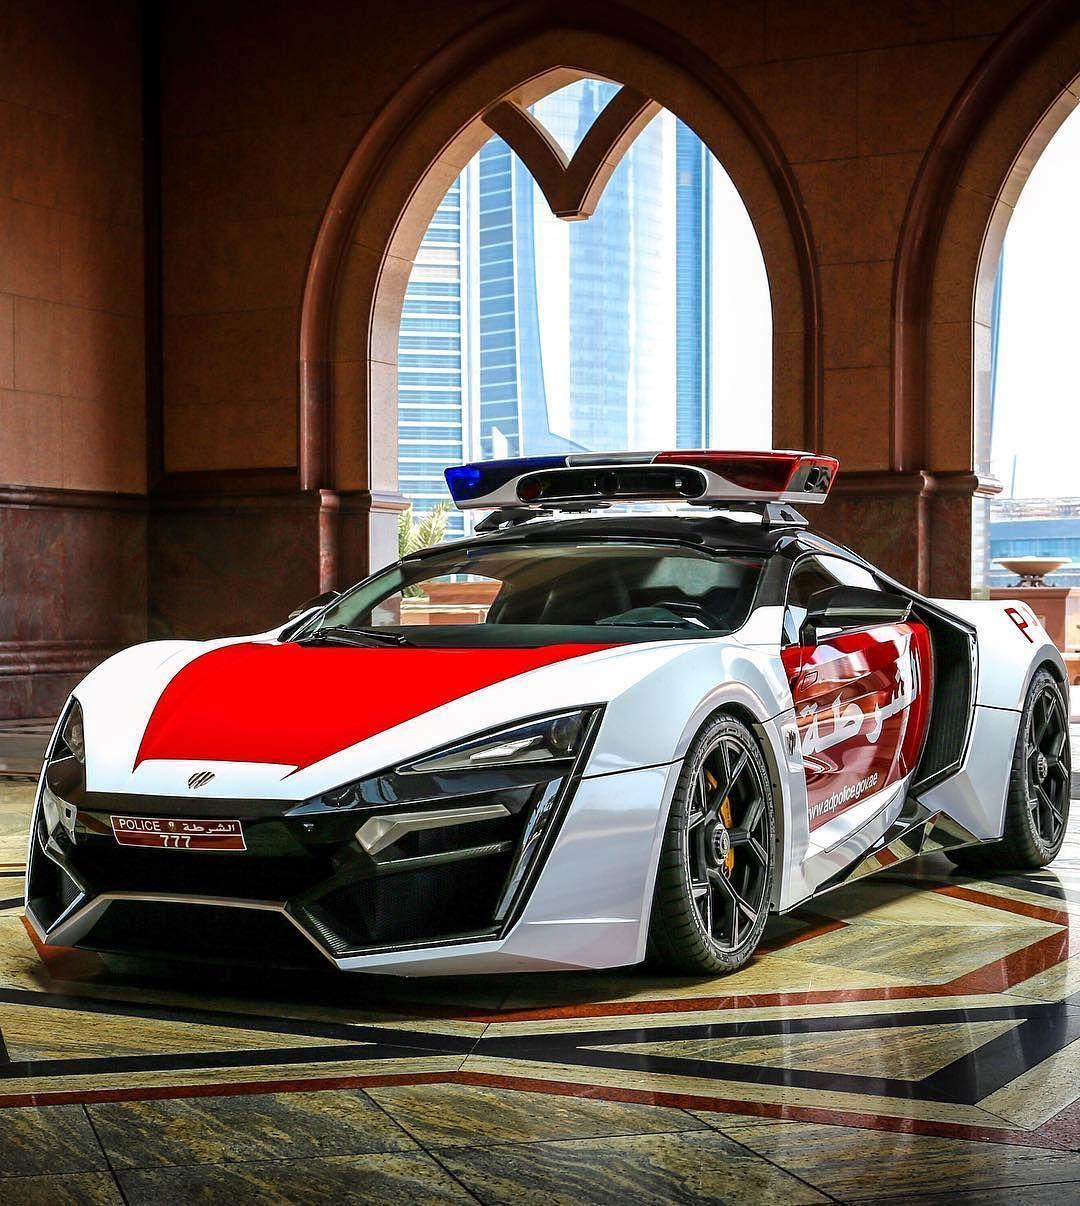 L�ks Otomobil �zel Jetler  #cars #luxurycars #sportcars #conceptcars #motorcycles #trucks